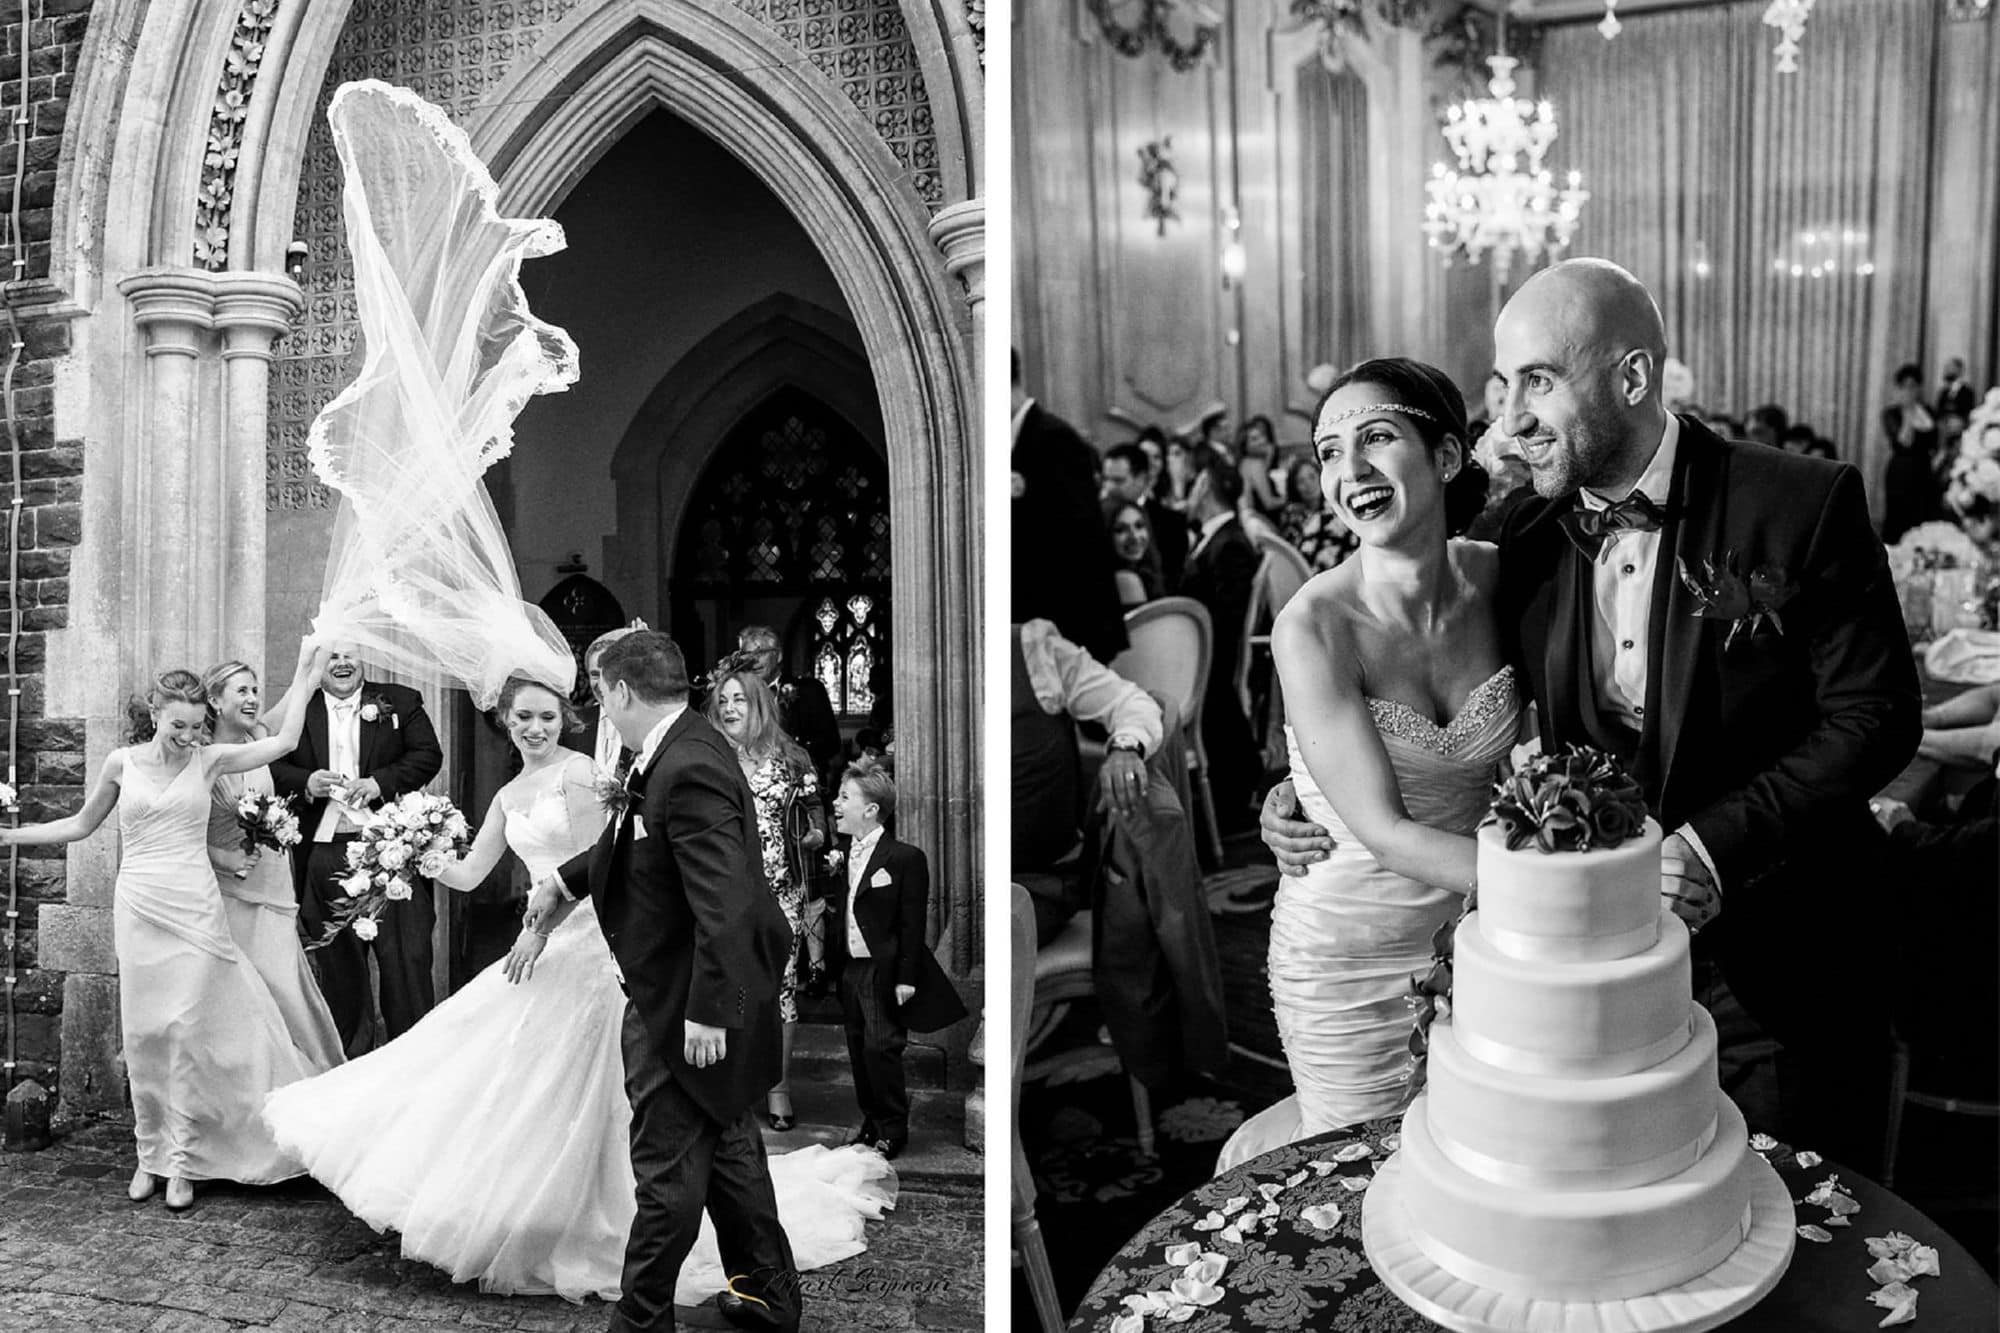 Mark-Seymour-Wedding-Photographer-UK-07 18